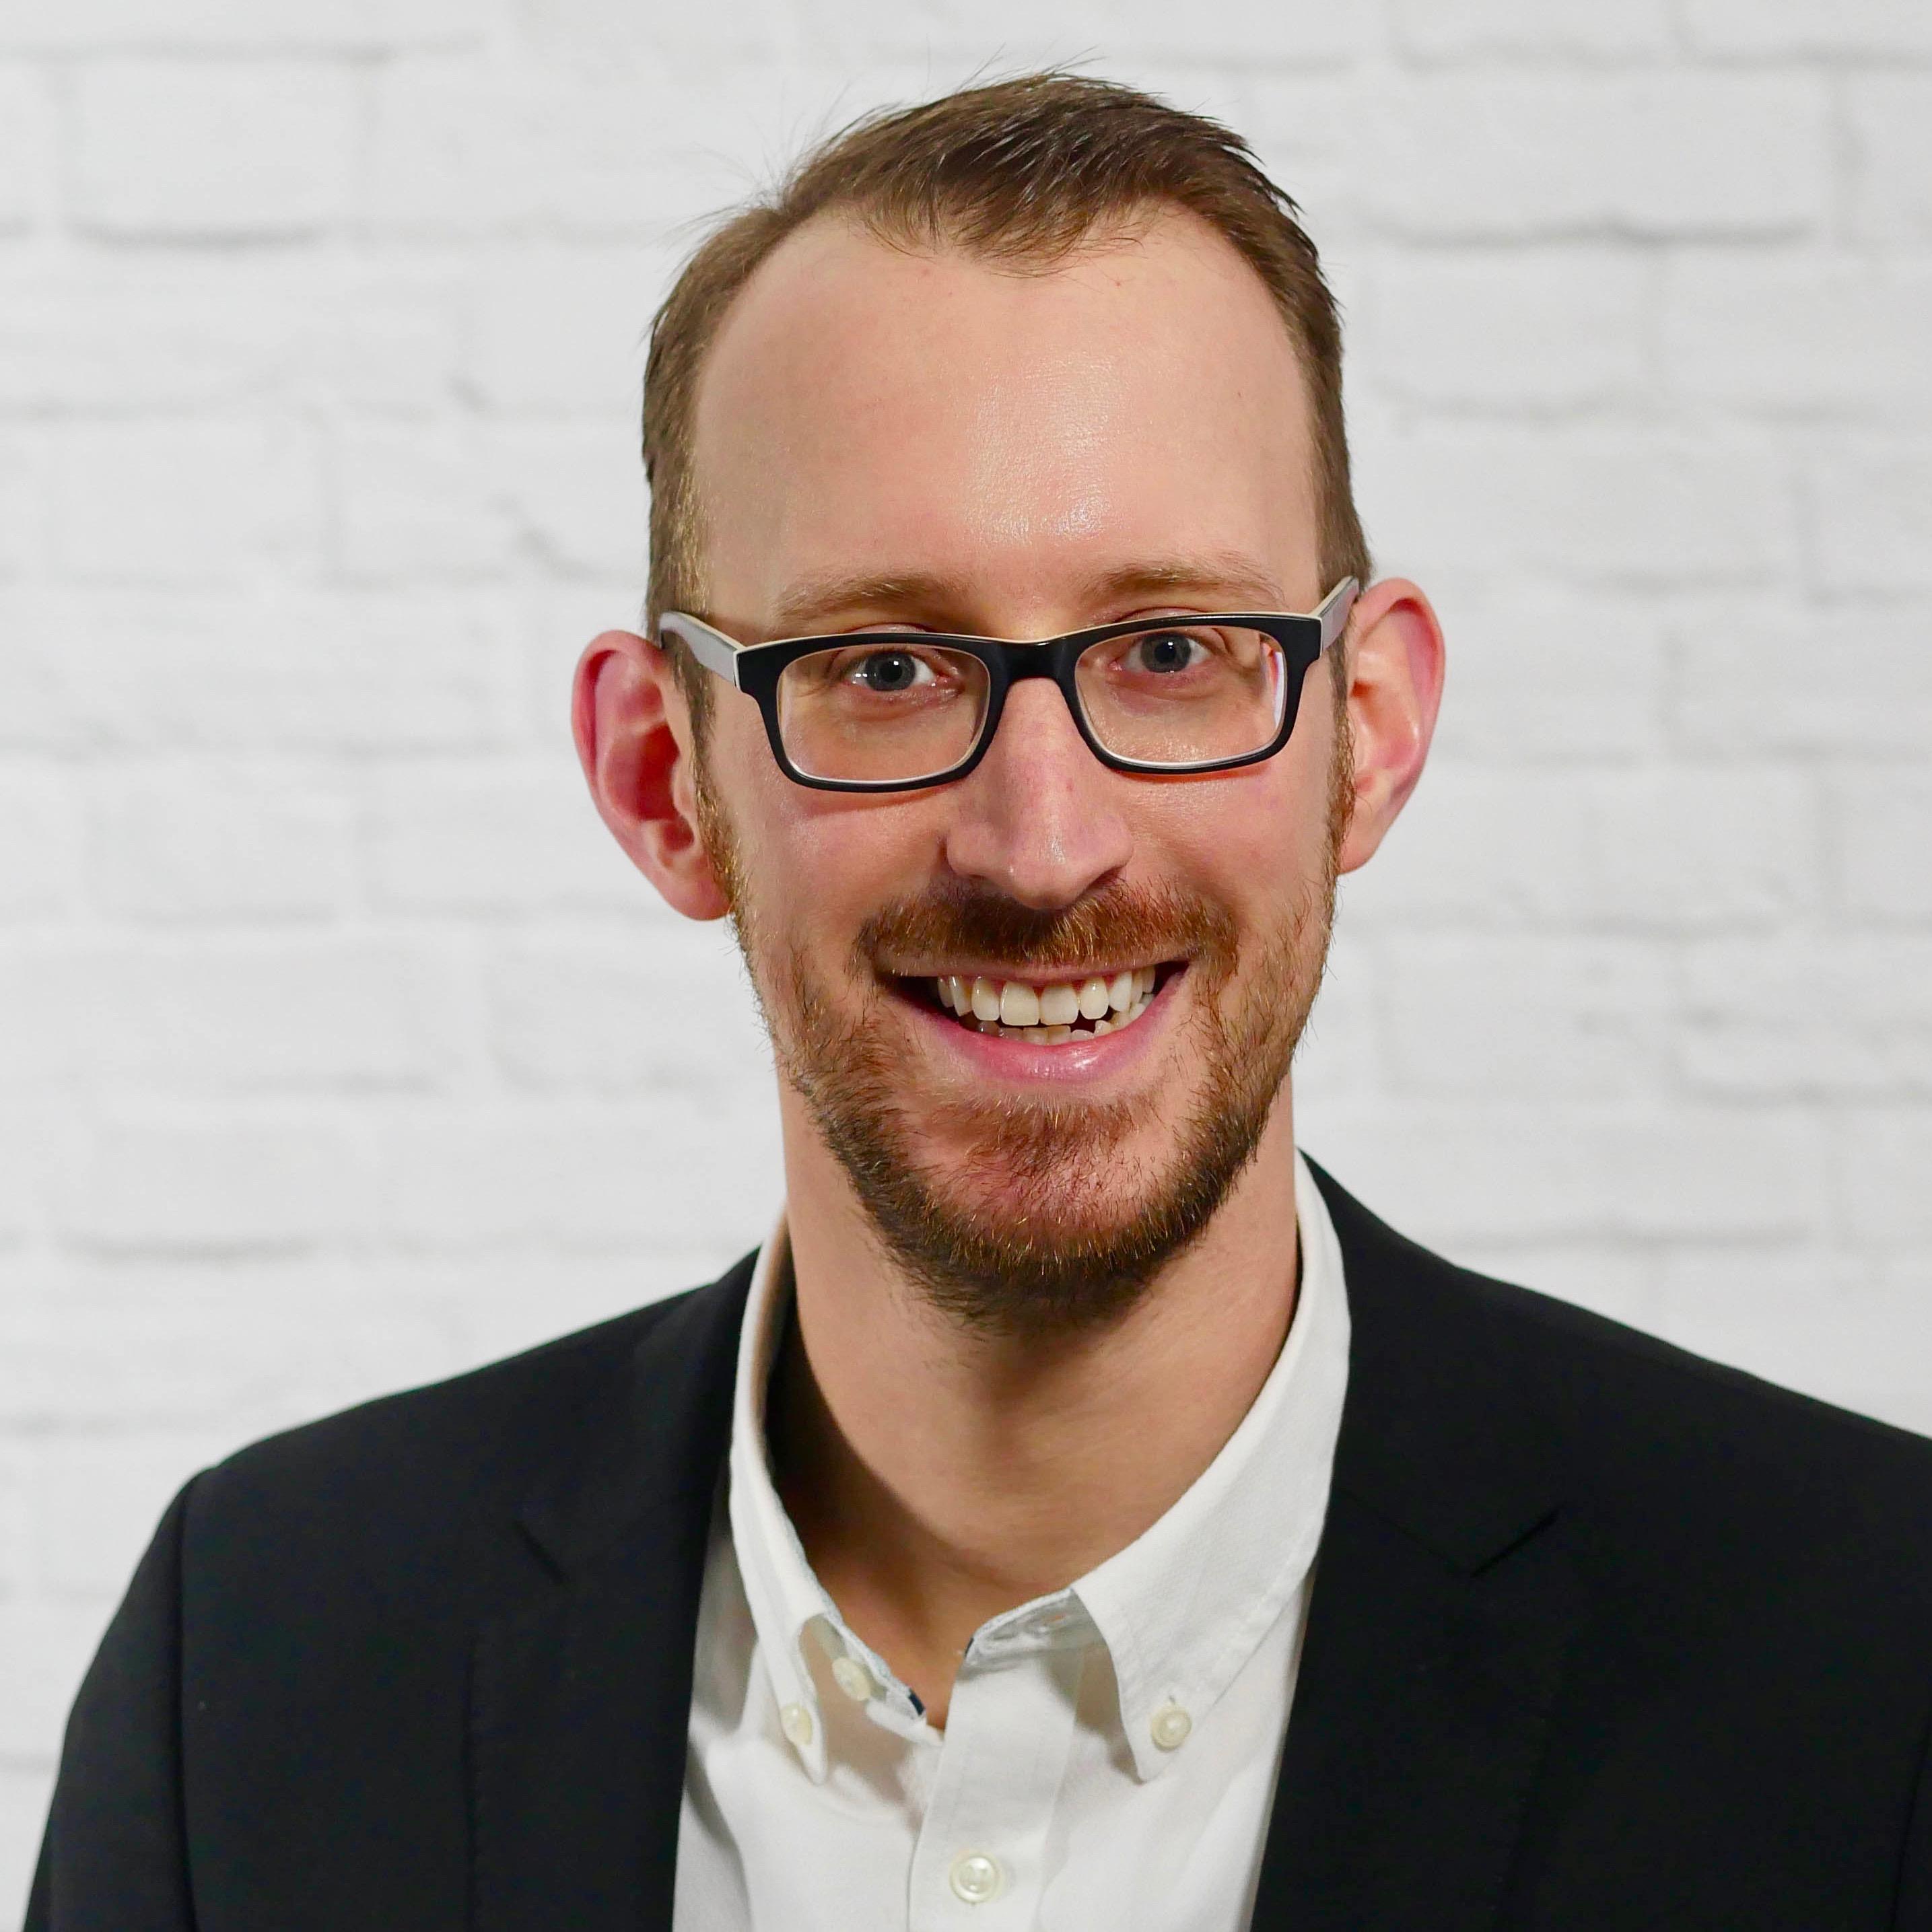 Philipp Gemmel